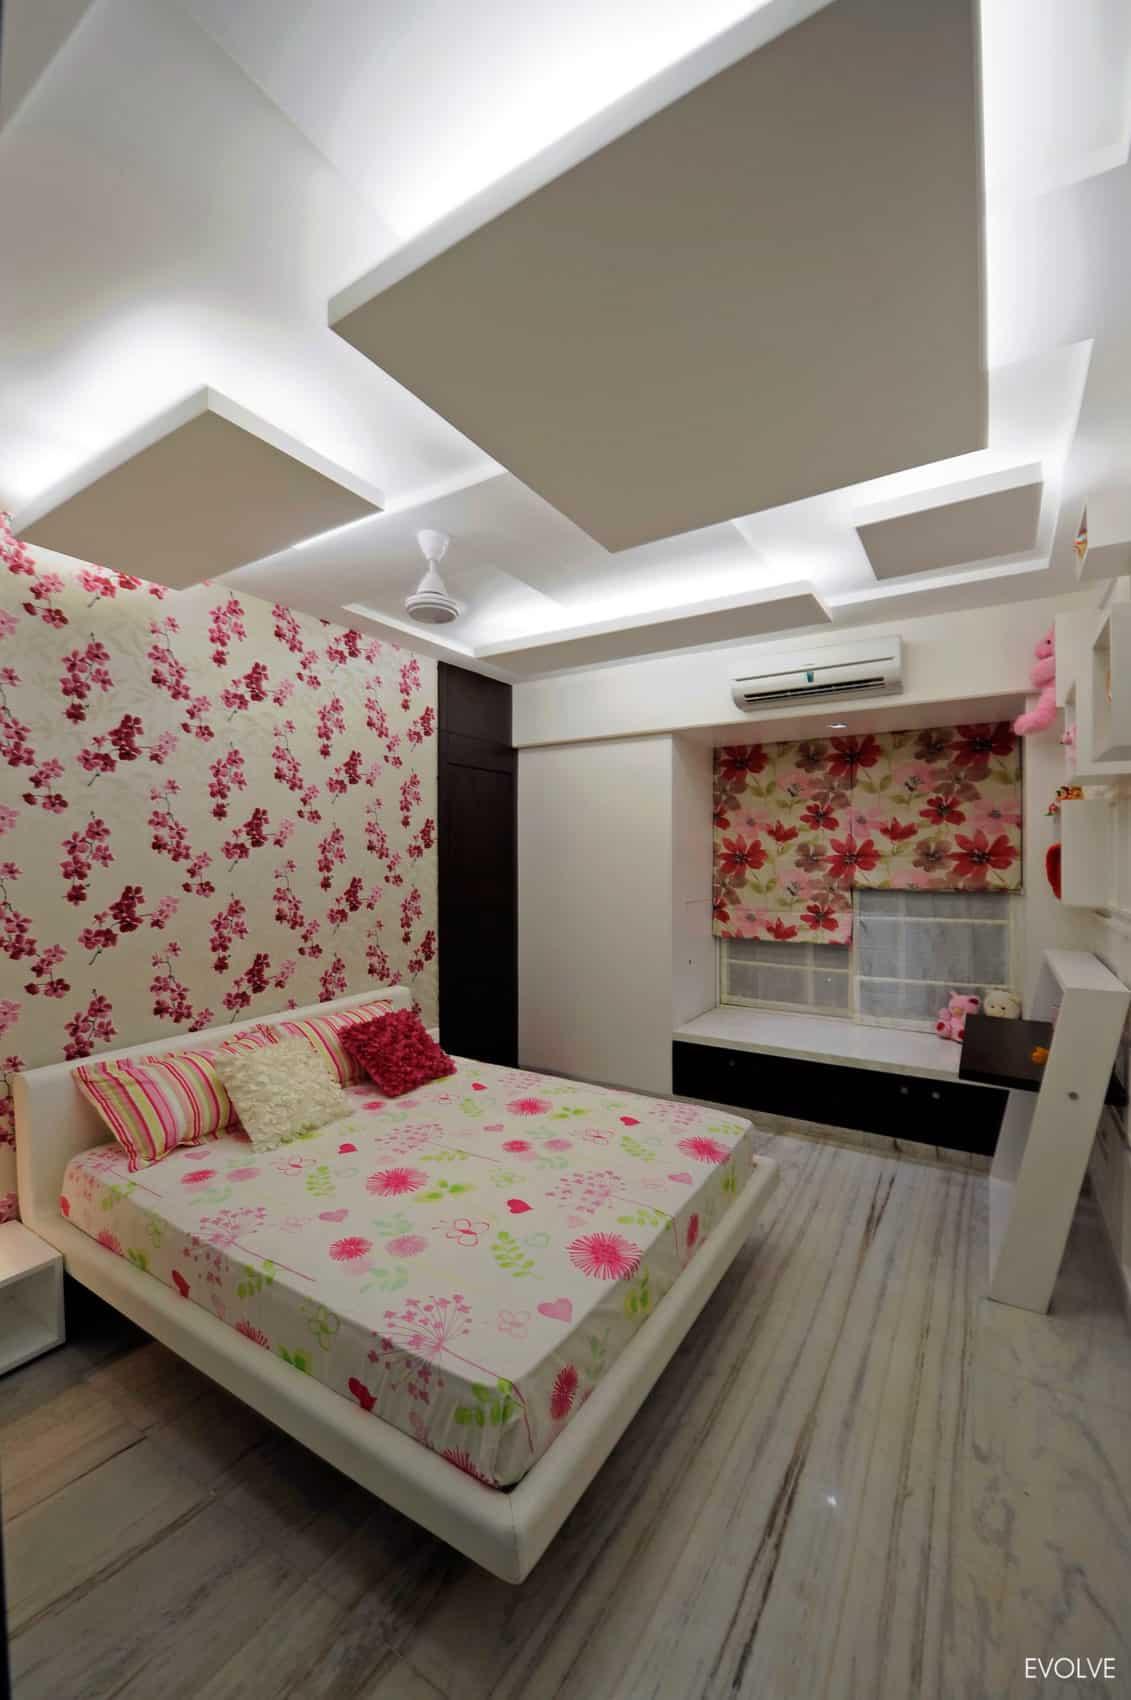 House in Mumbai by Evolve (14)